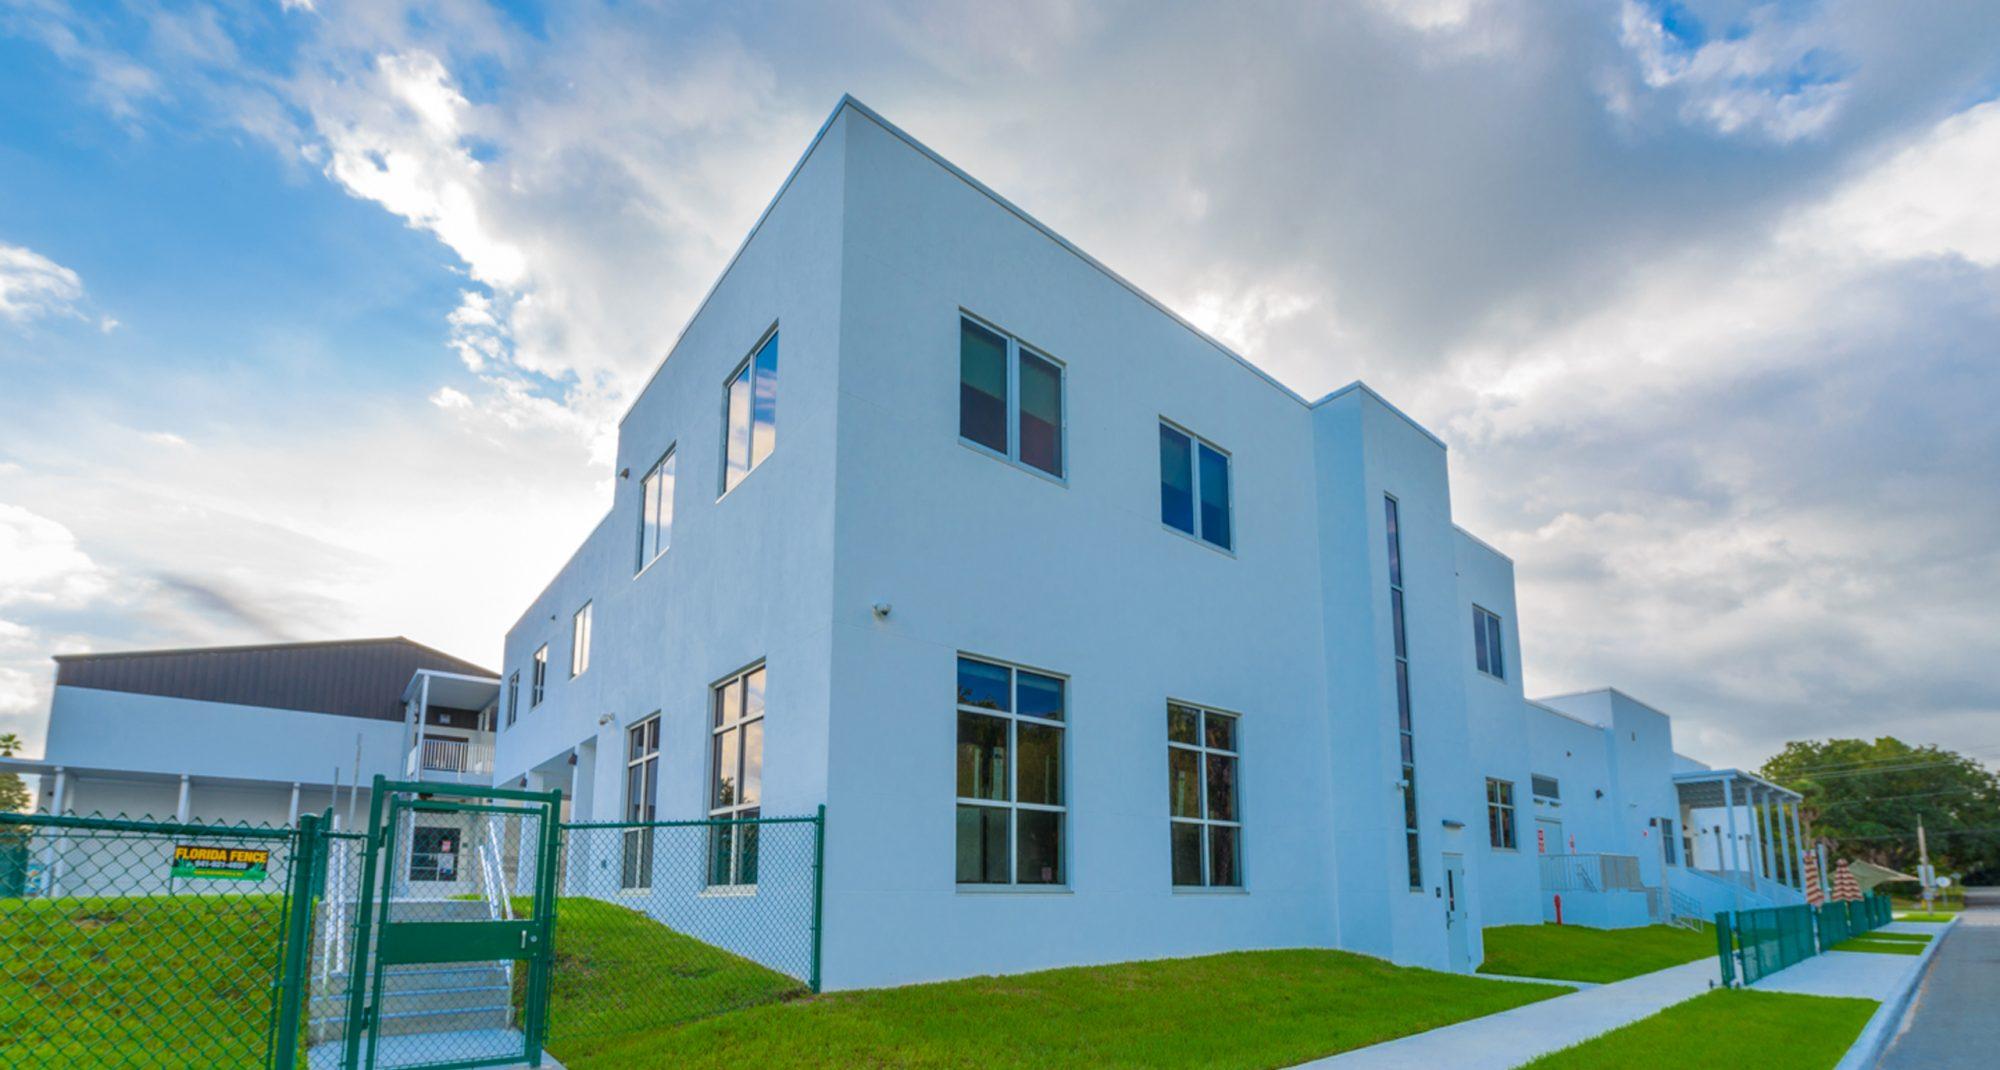 BayHaven  Elementary